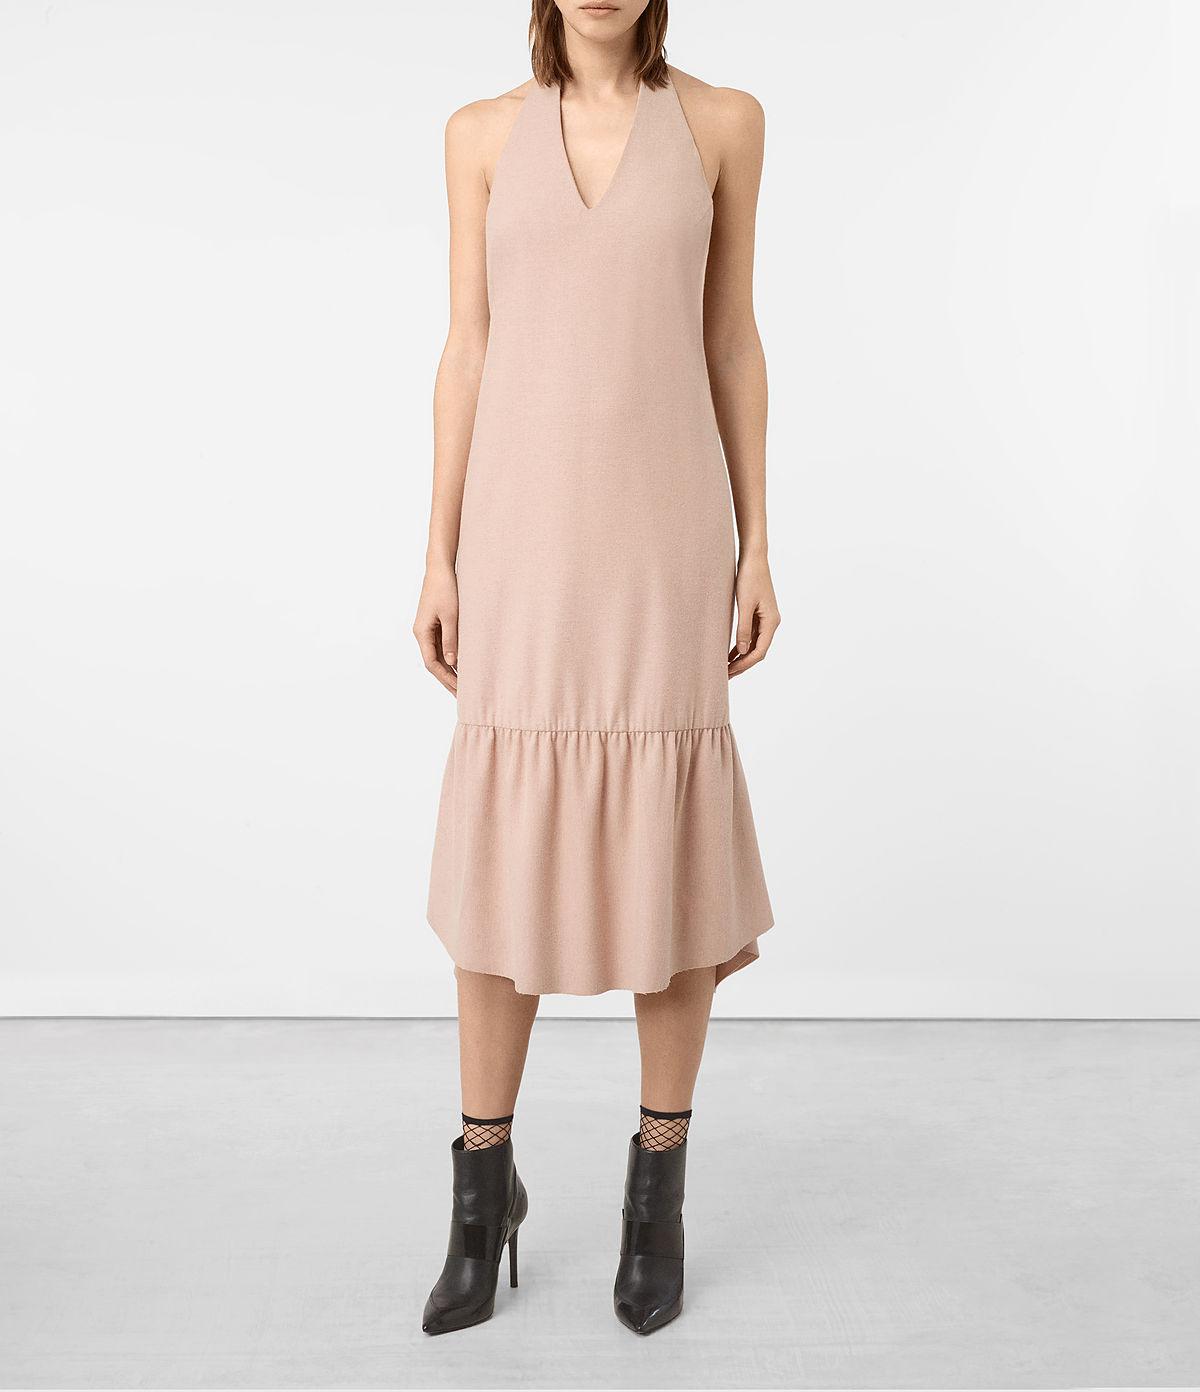 emelie-wool-dress